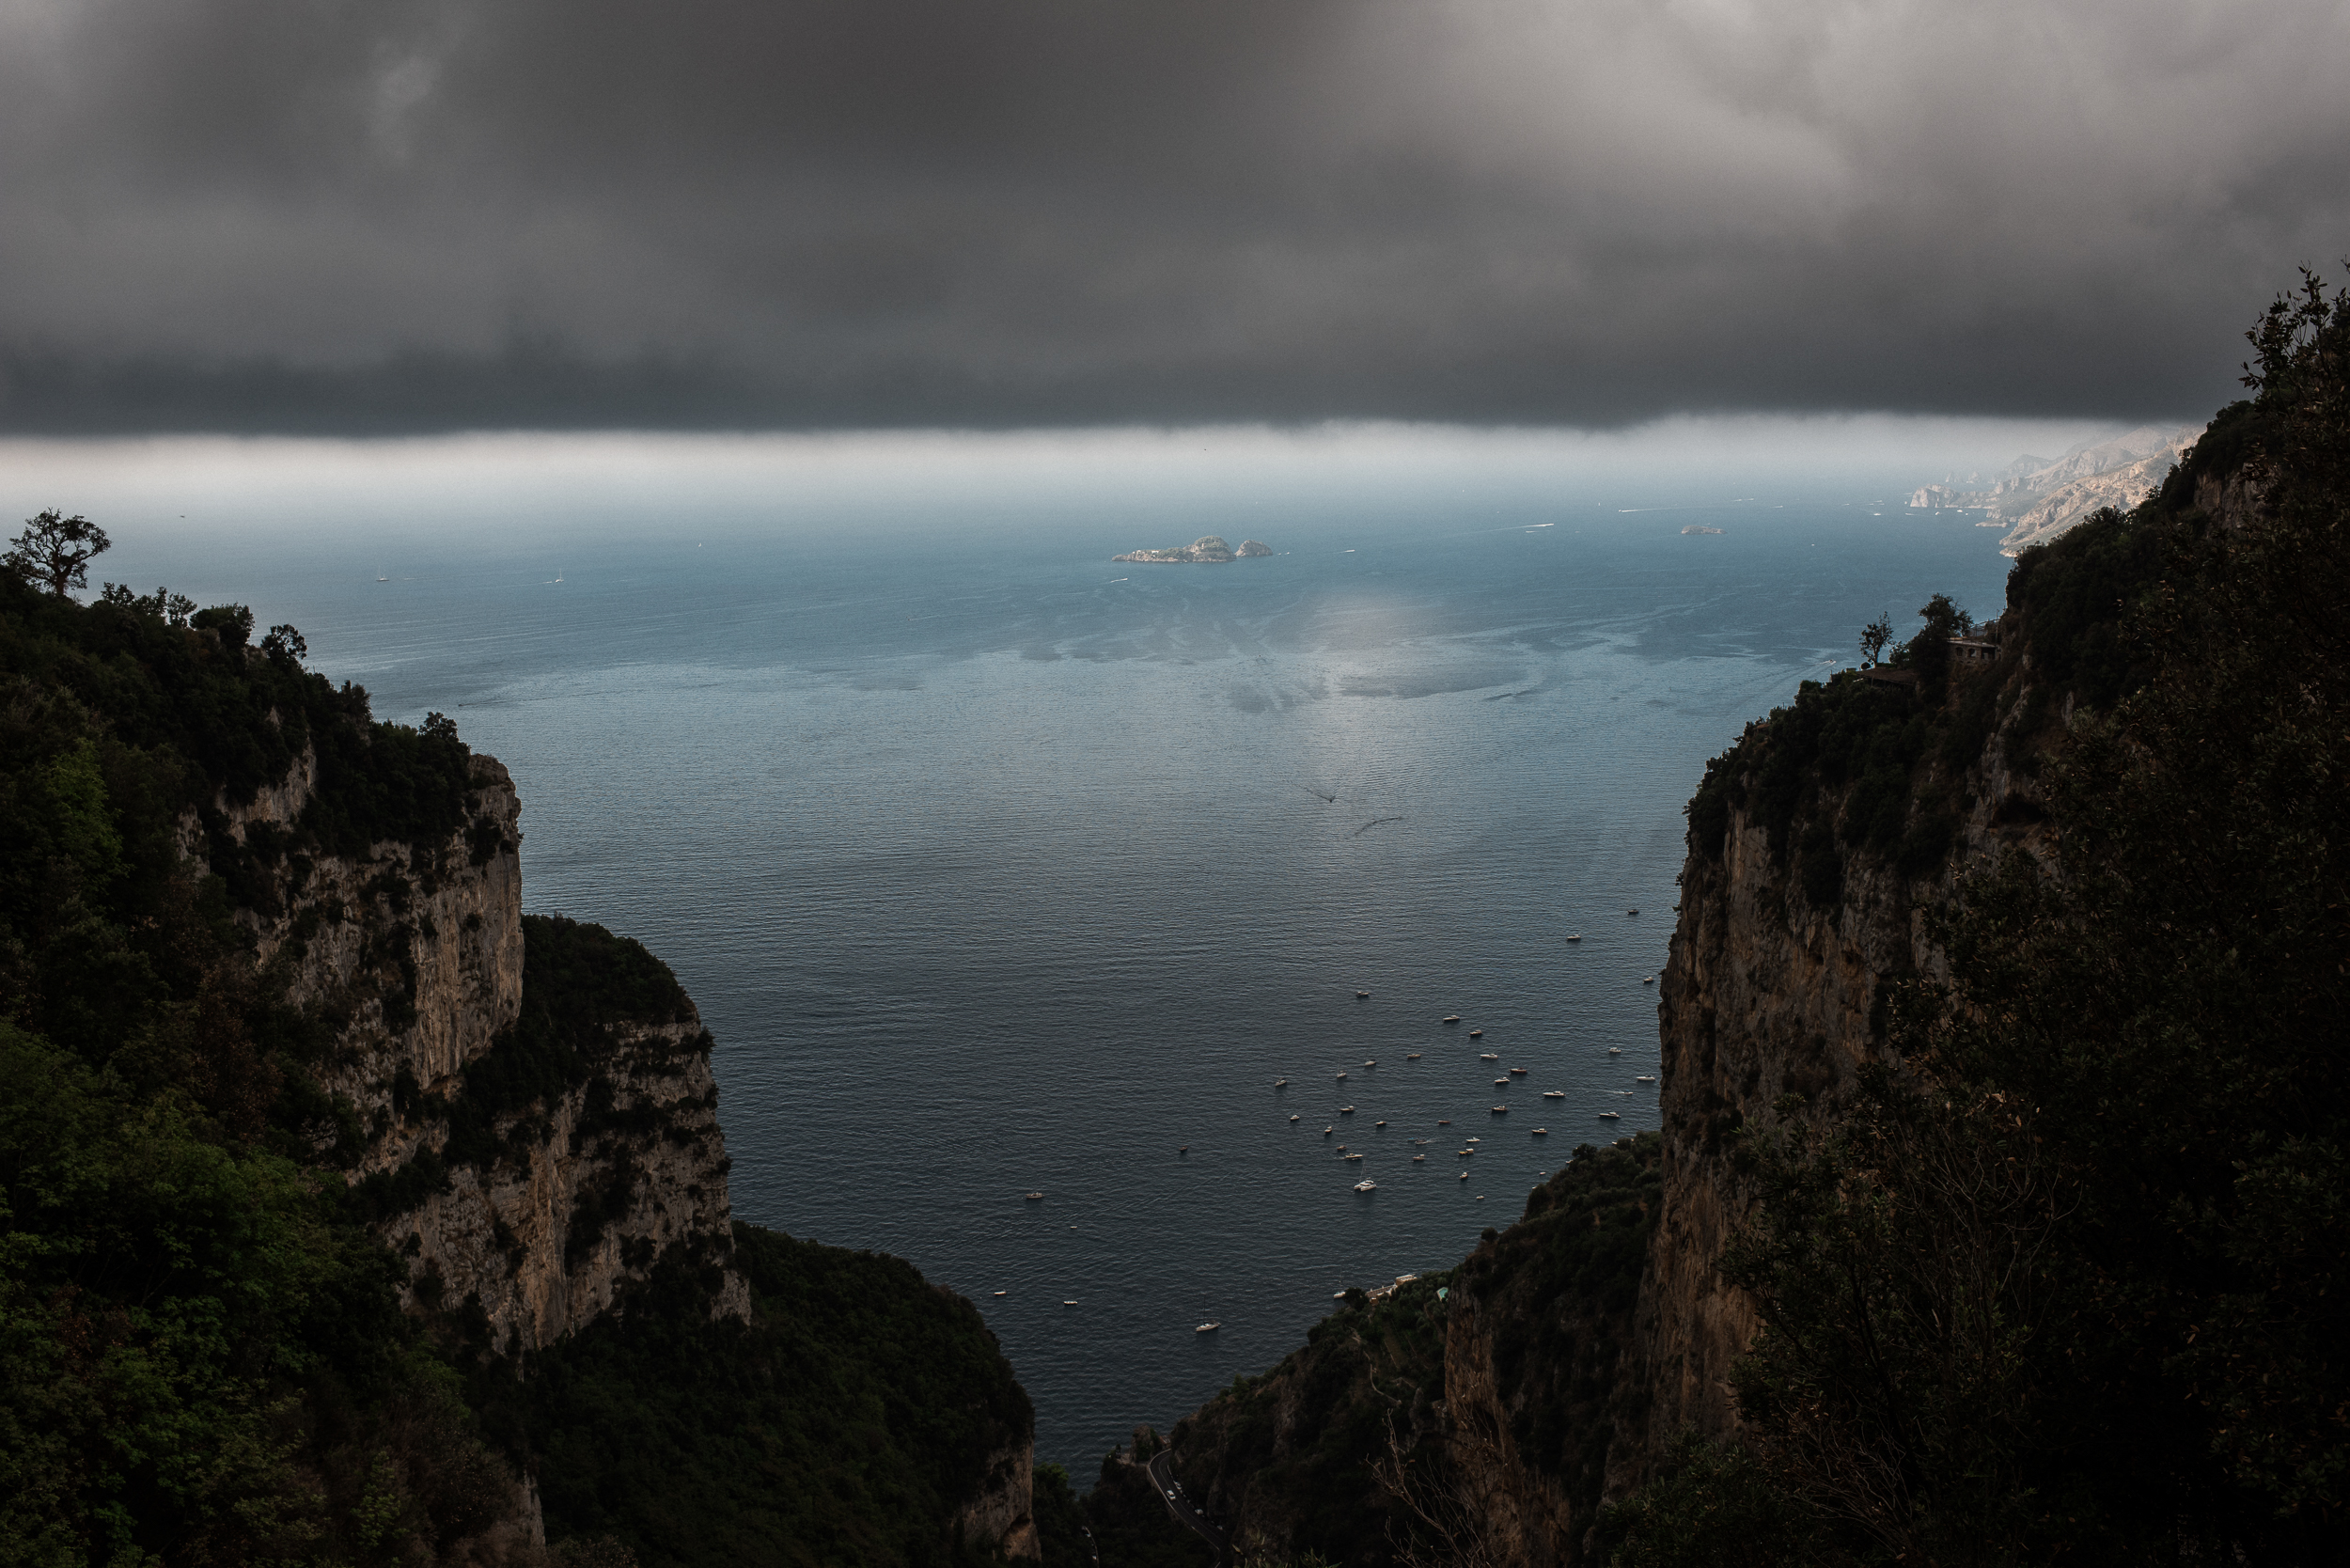 Europe_2018_ITALY_TaraShupe_Photography_DSC_4330.jpg